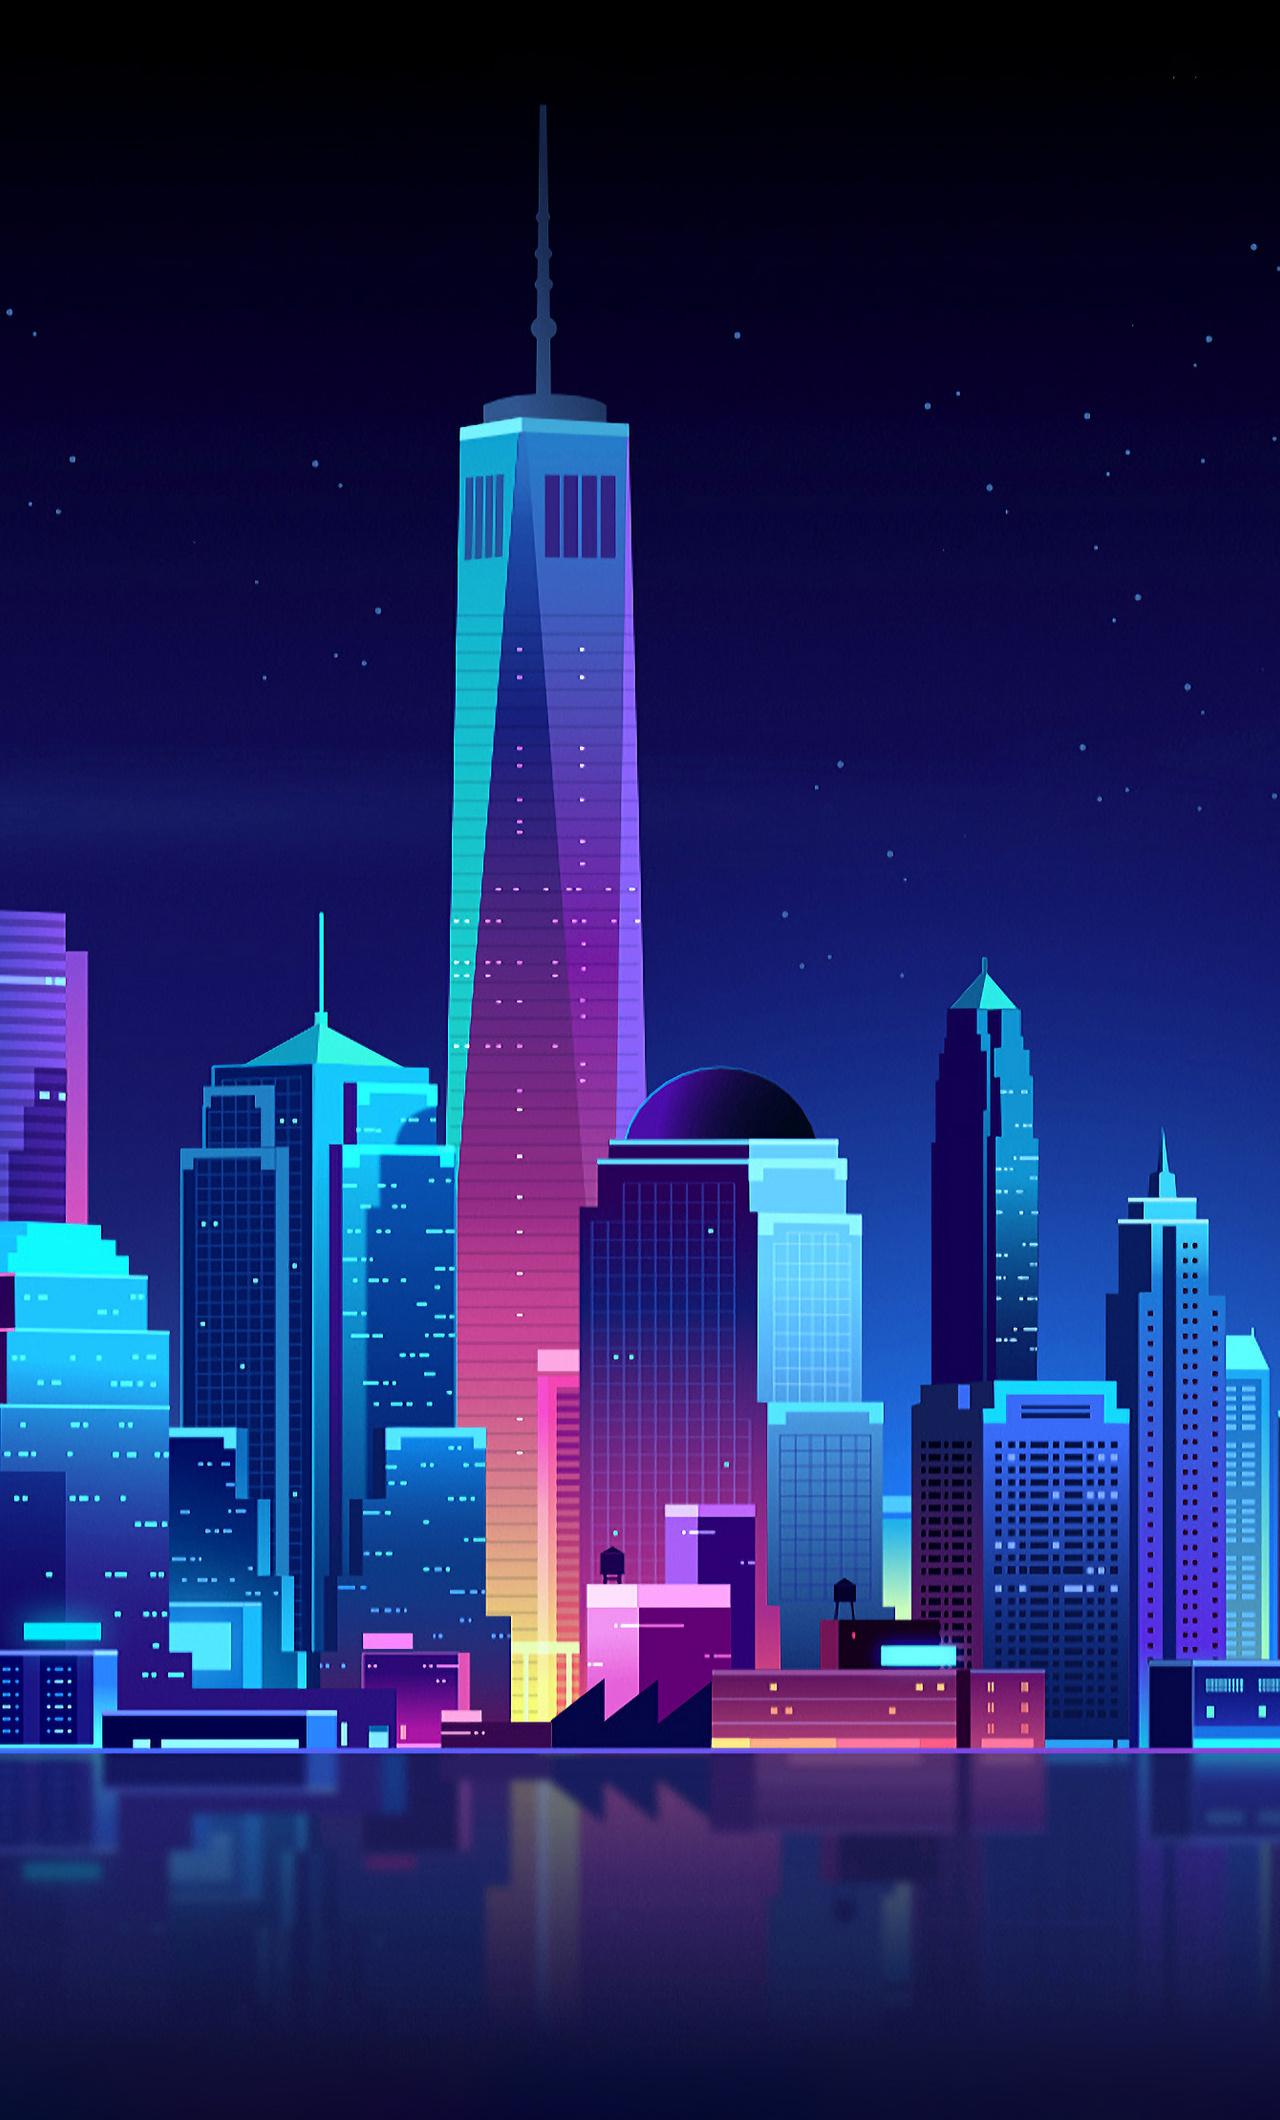 city night iphone 6 wallpaper